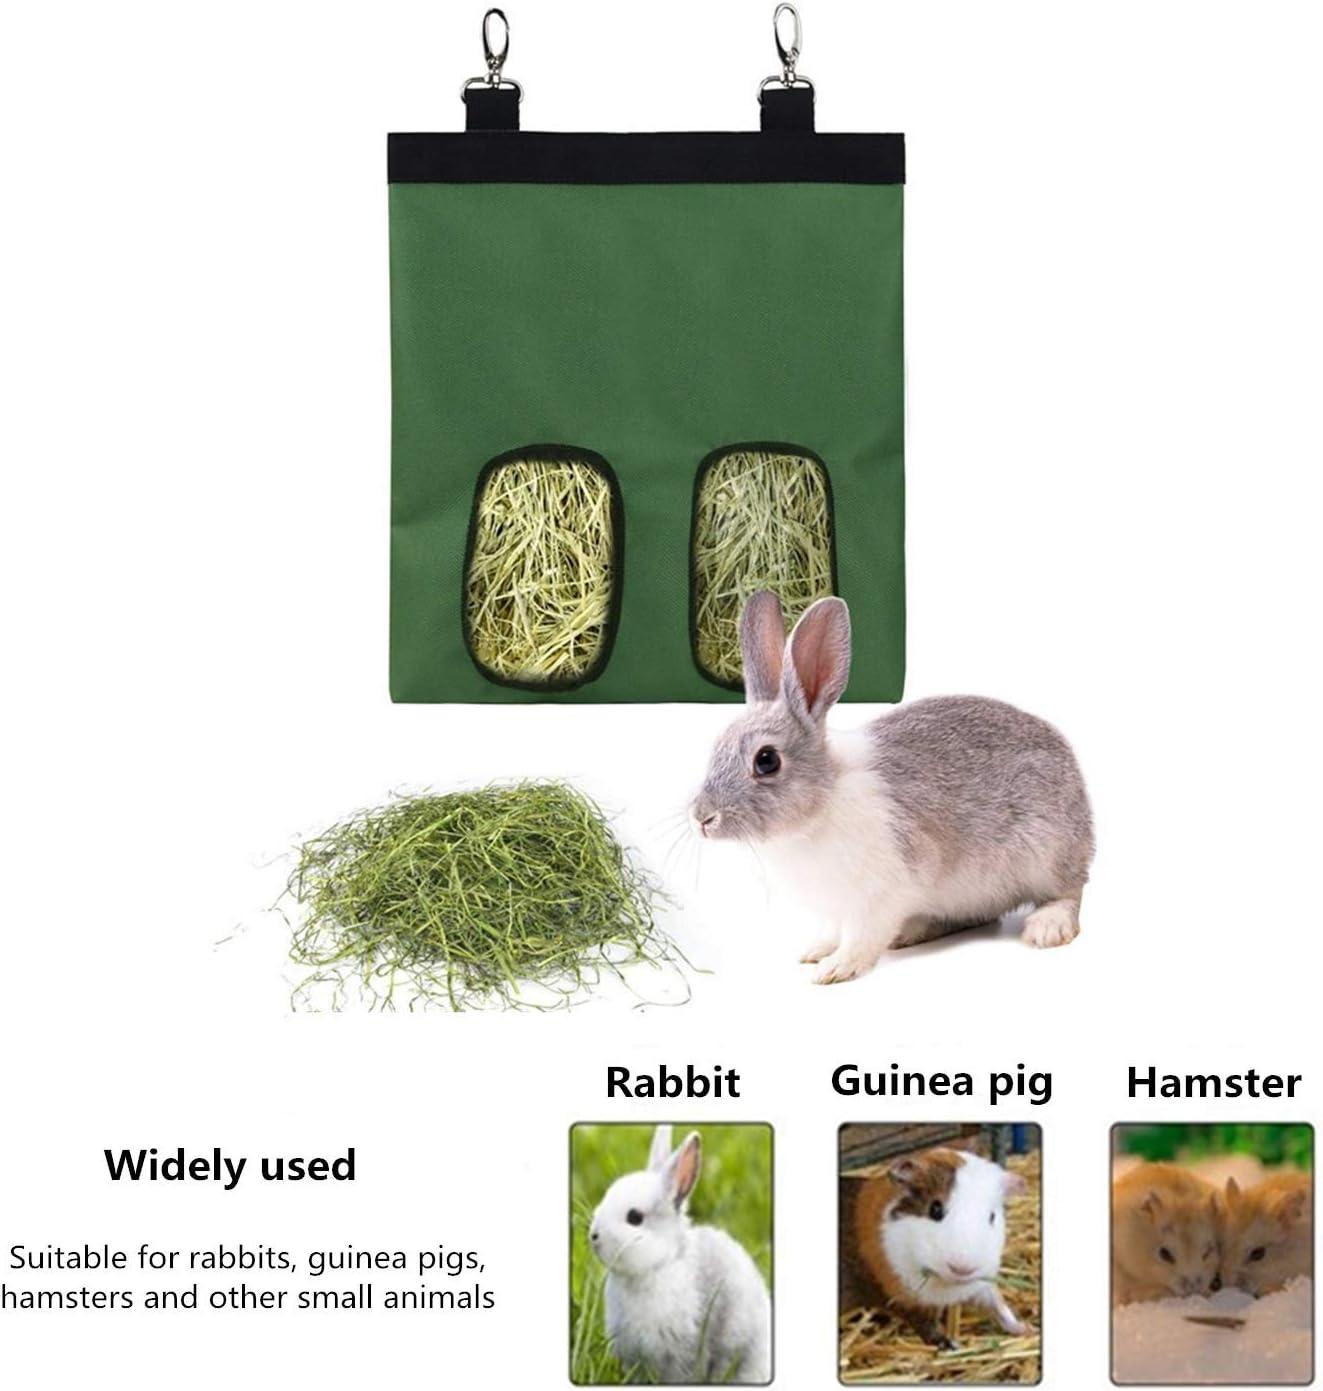 Large Size 600D Oxford Cloth Fabric Rabbit Hay Feeder Bag,Guinea Pig Hay Feeder,Hanging Feeding Storage Bag for Small Animals,Hay Automatic Feeder Bag